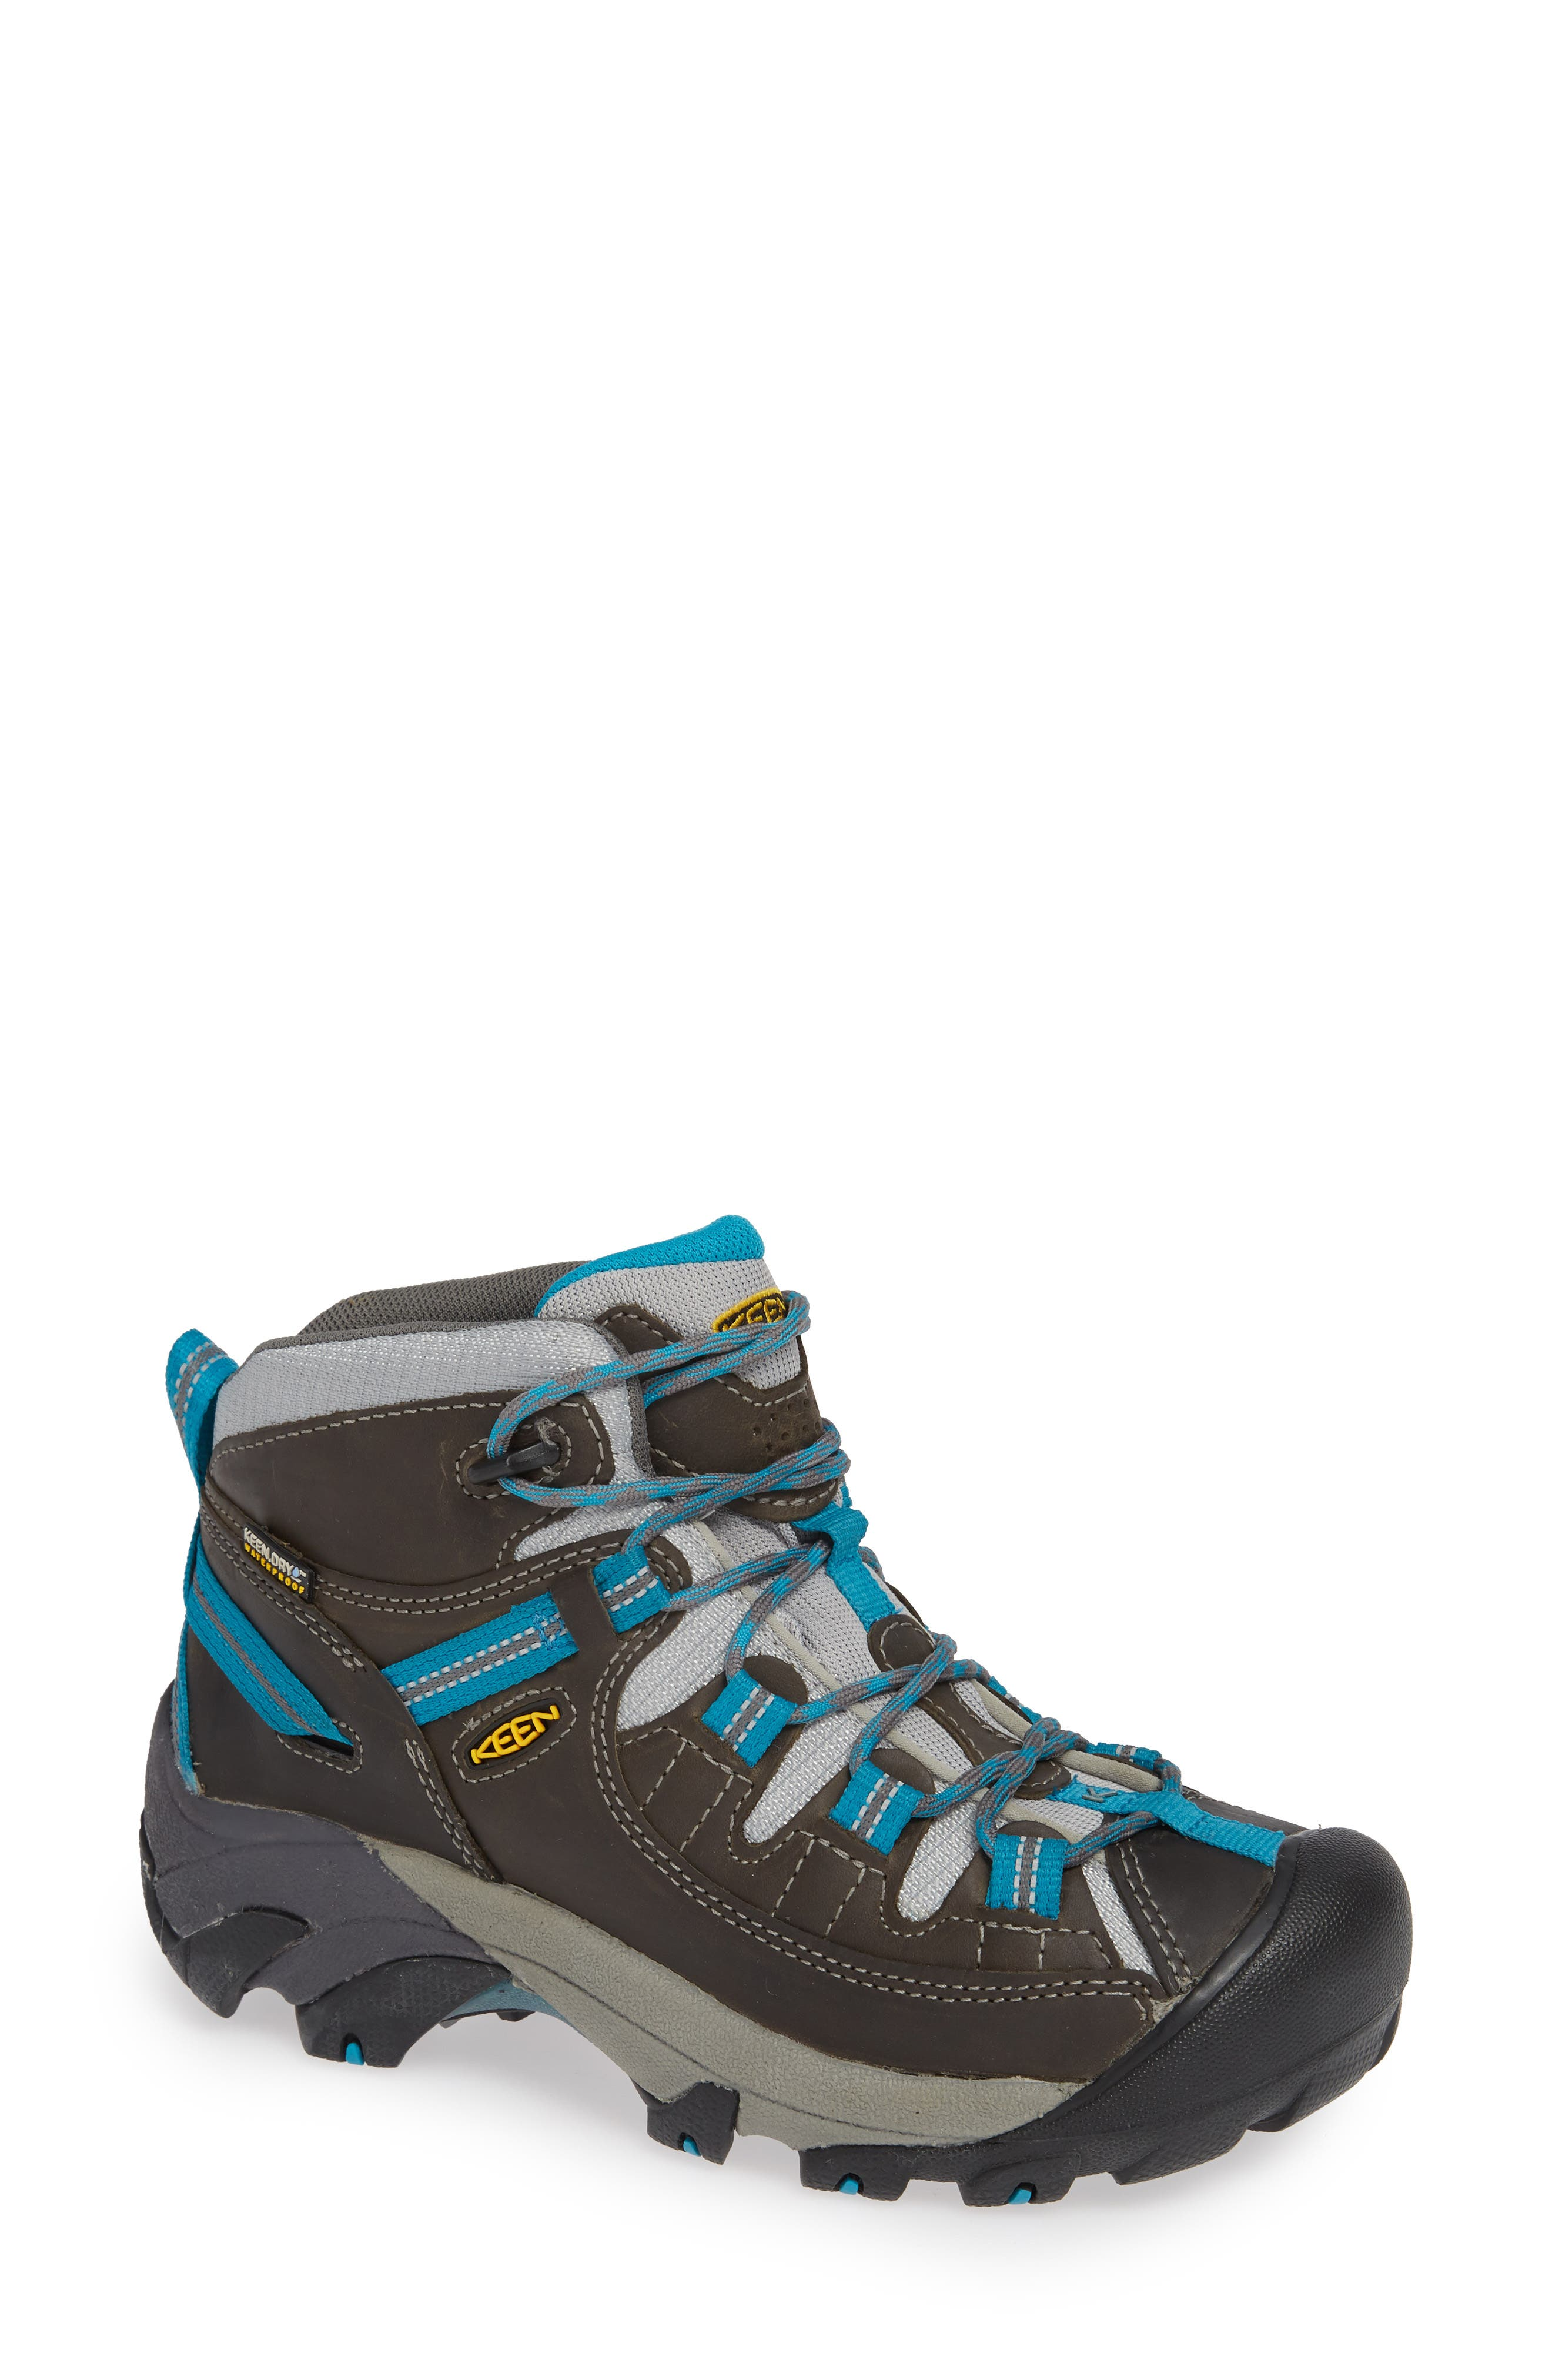 Keen Targhee Ii Mid Waterproof Hiking Boot- Grey